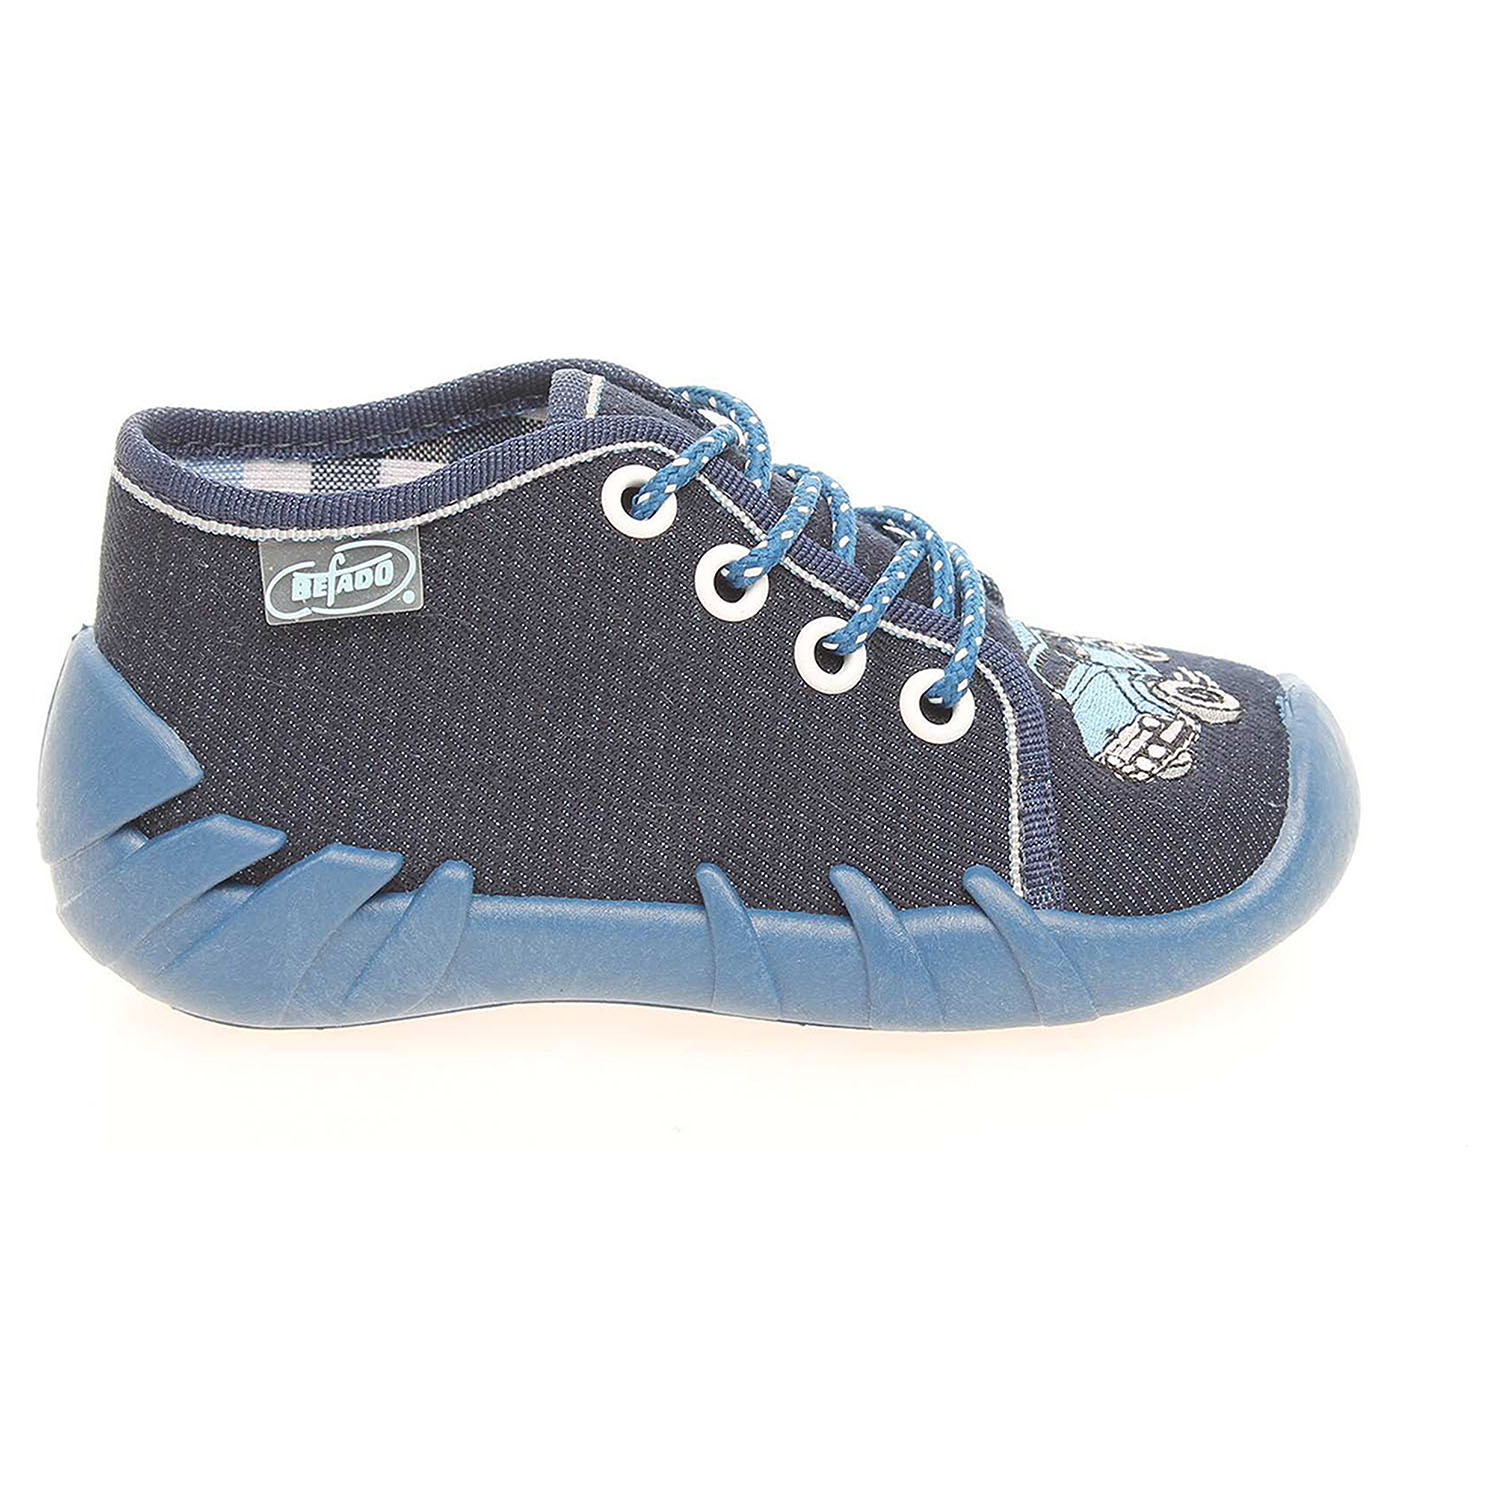 Befado chlapecké bačkory 130P058 modré 18